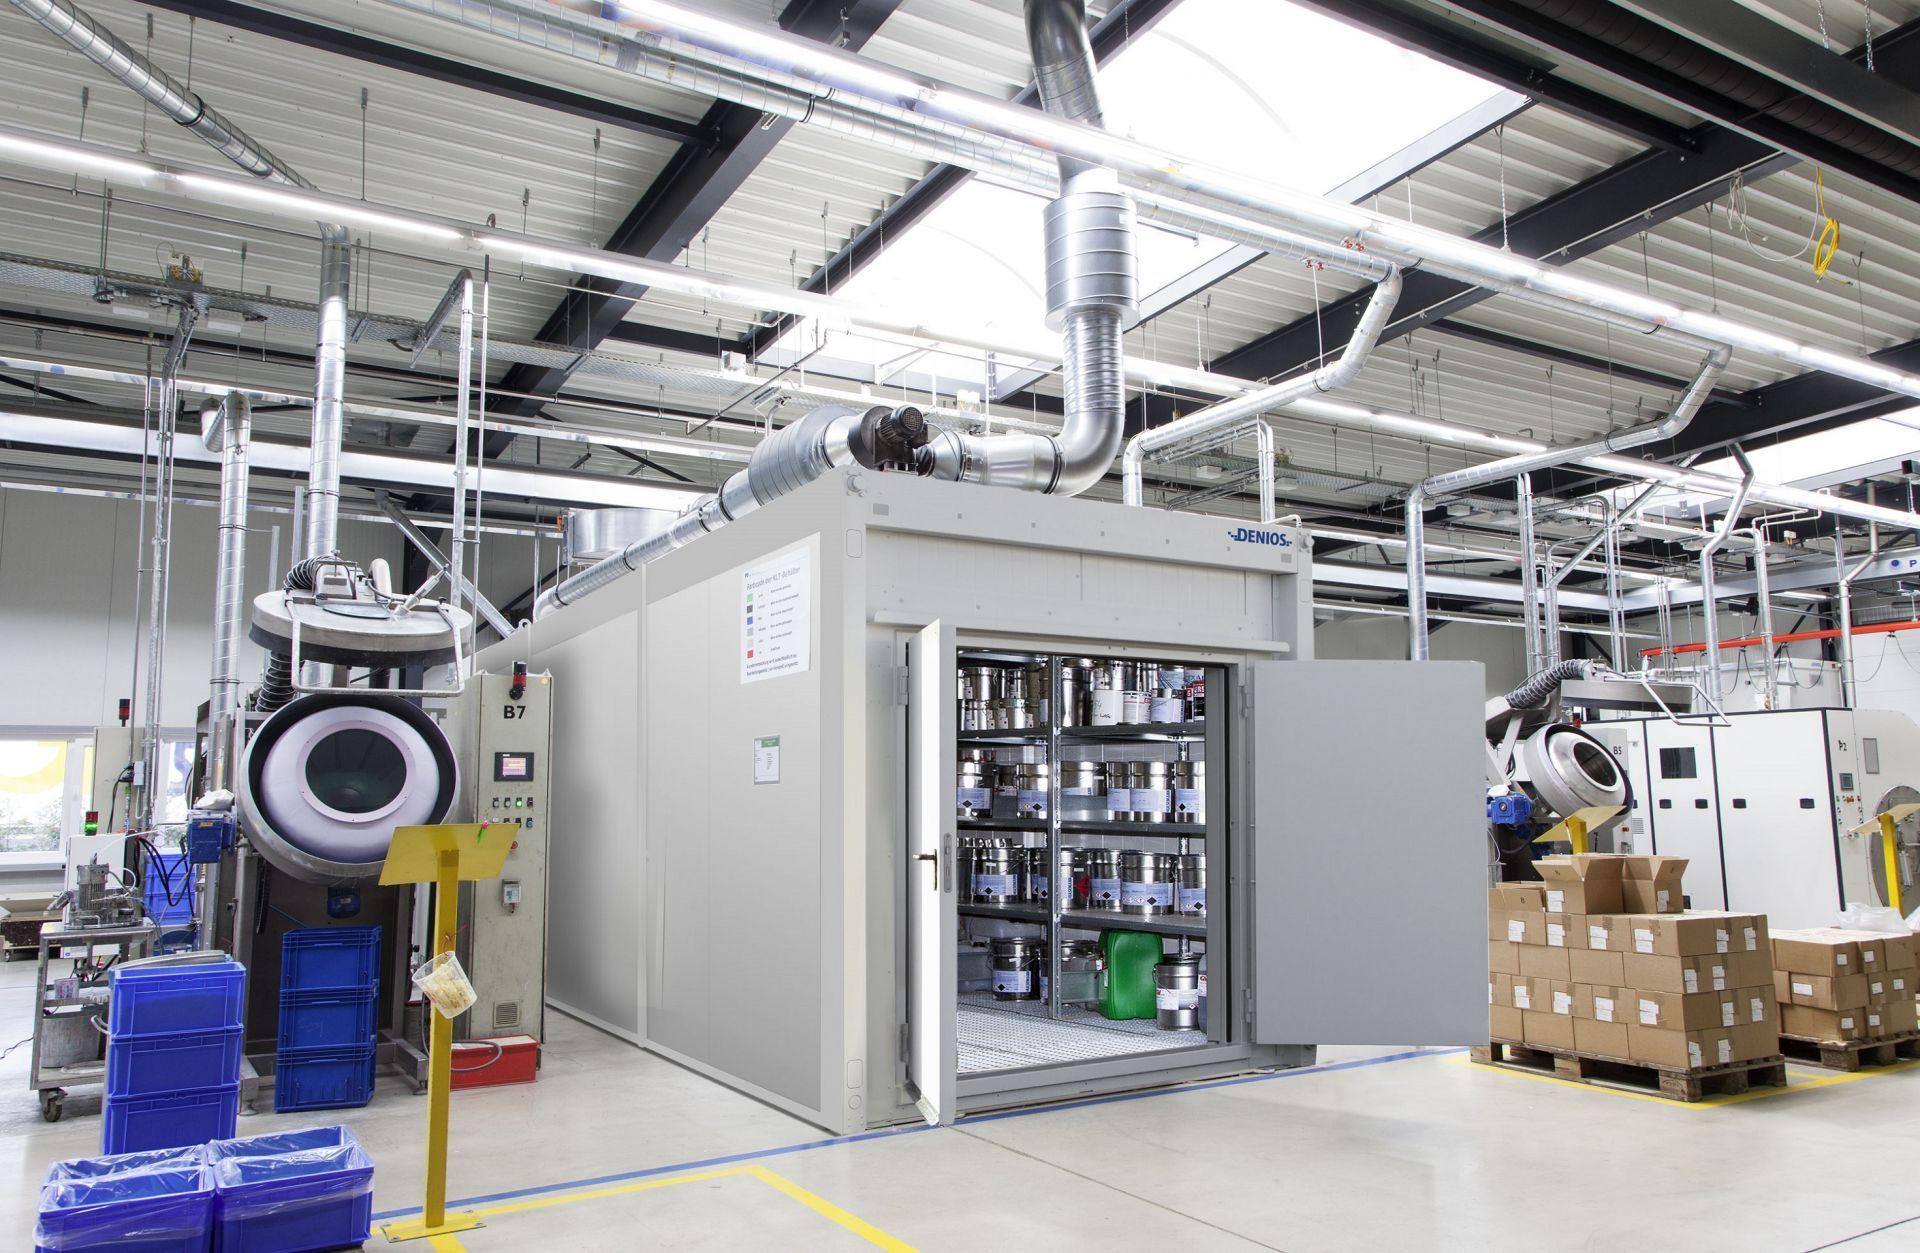 Take a look in DENIOS factory building